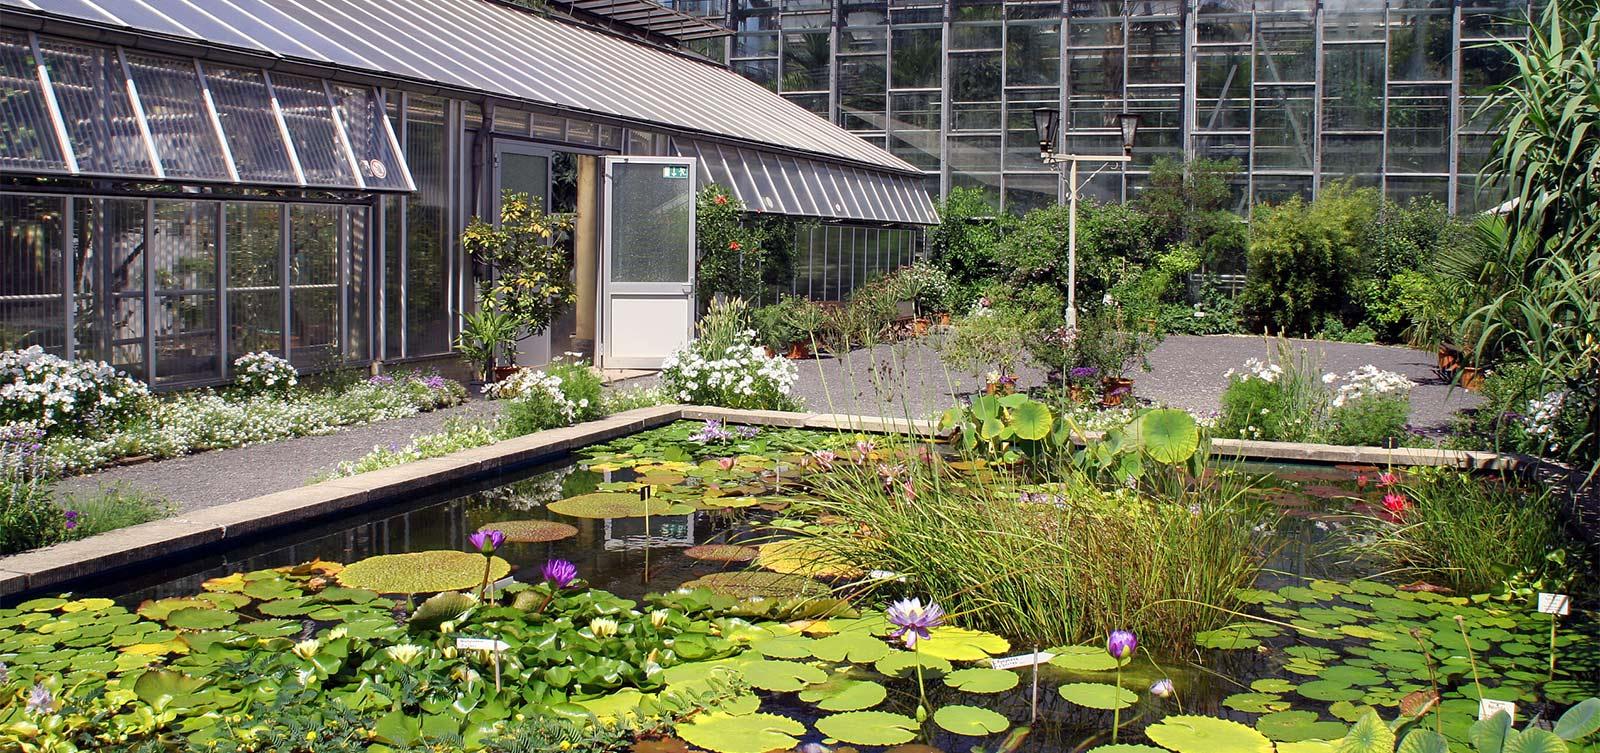 Botanischer Garten Jena